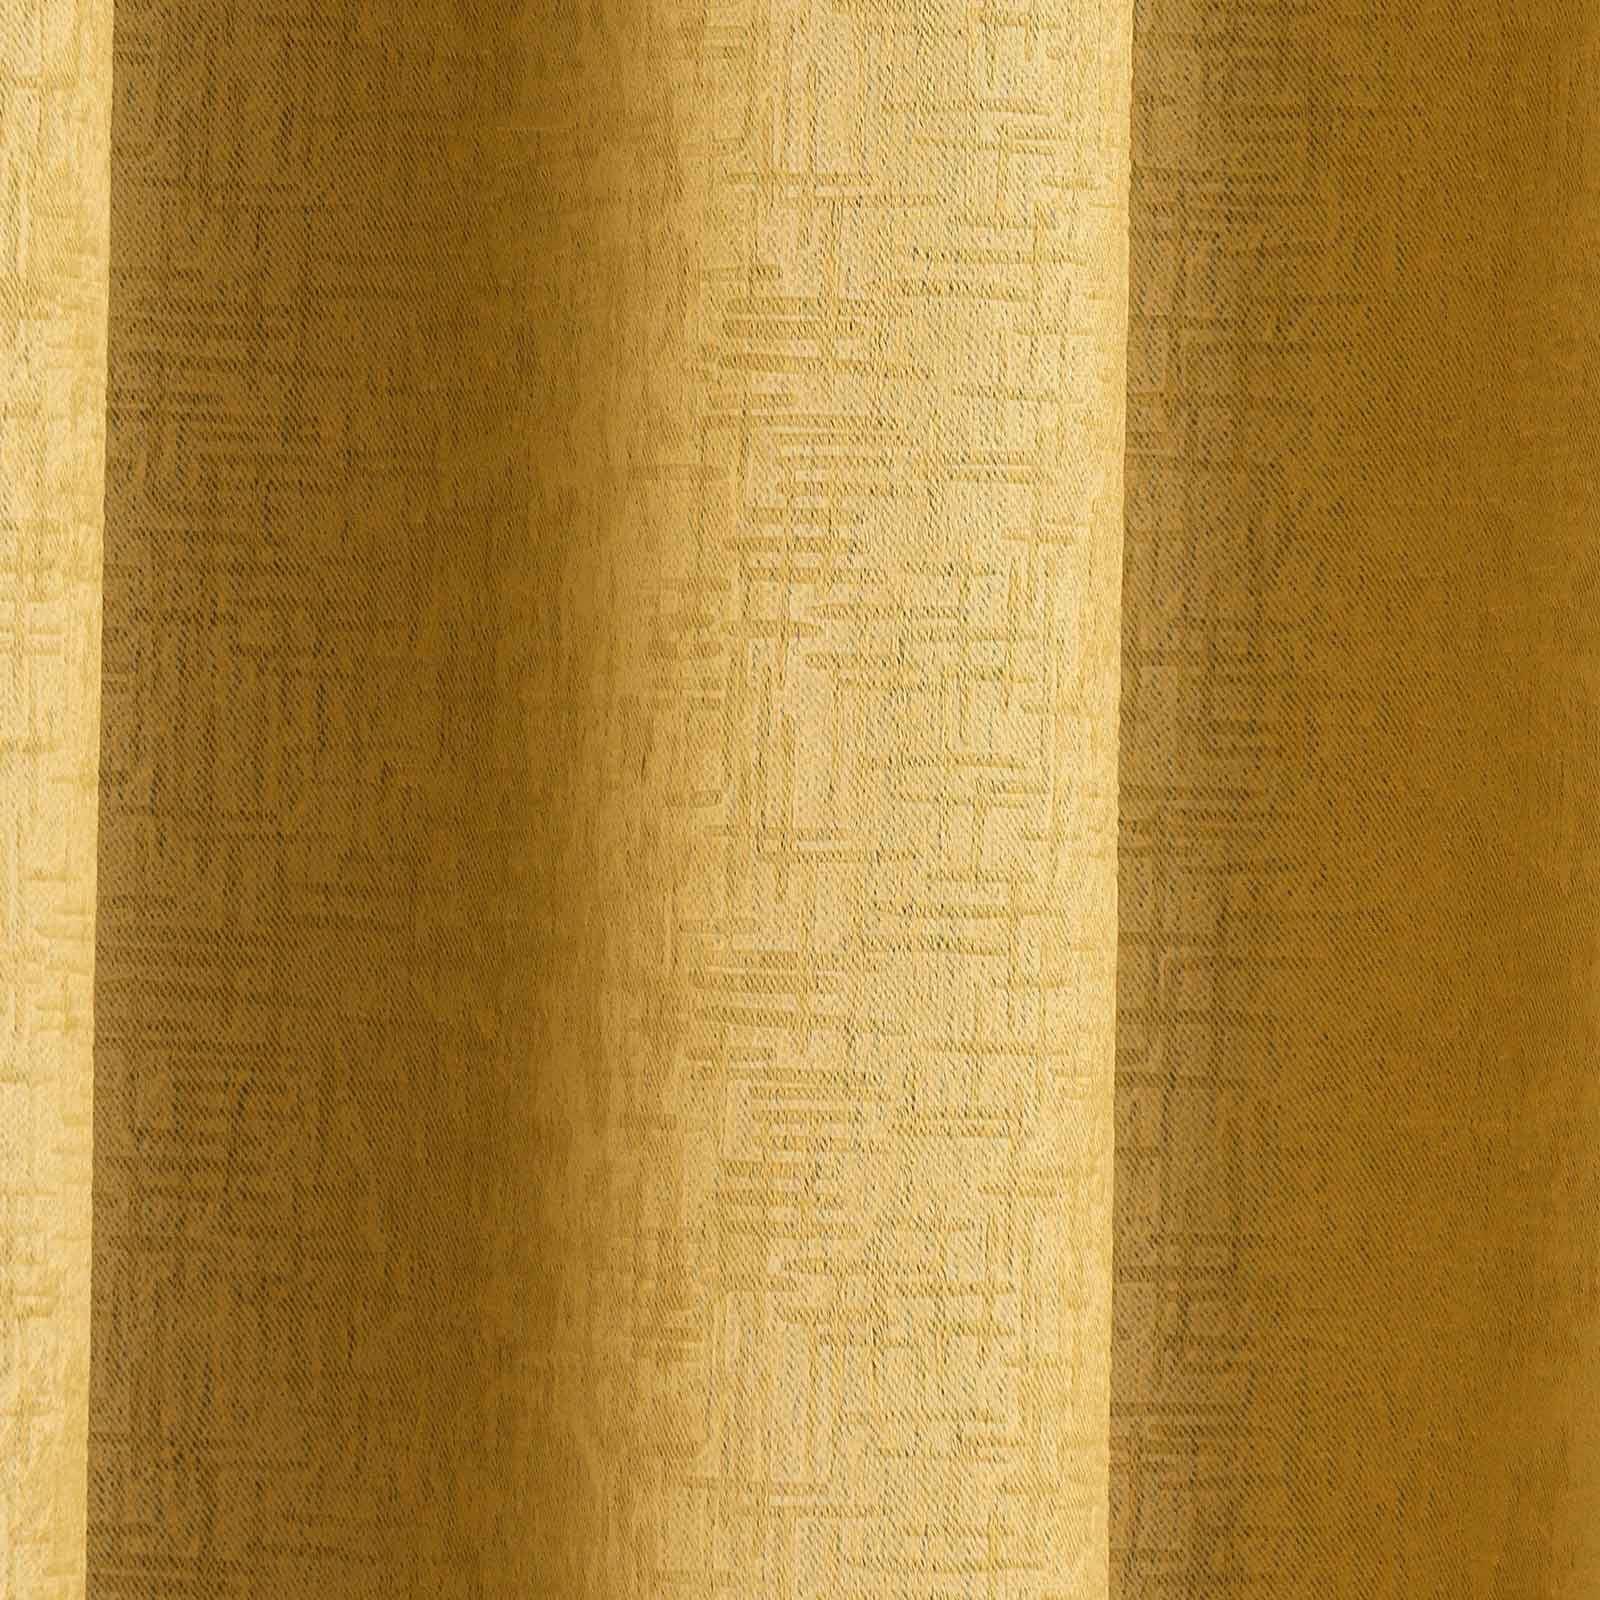 Cortina-con-Ojales-de-mostaza-pares-Amarillo-Ocre-Anillo-Top-Forrado-Listo-Cortinas miniatura 14